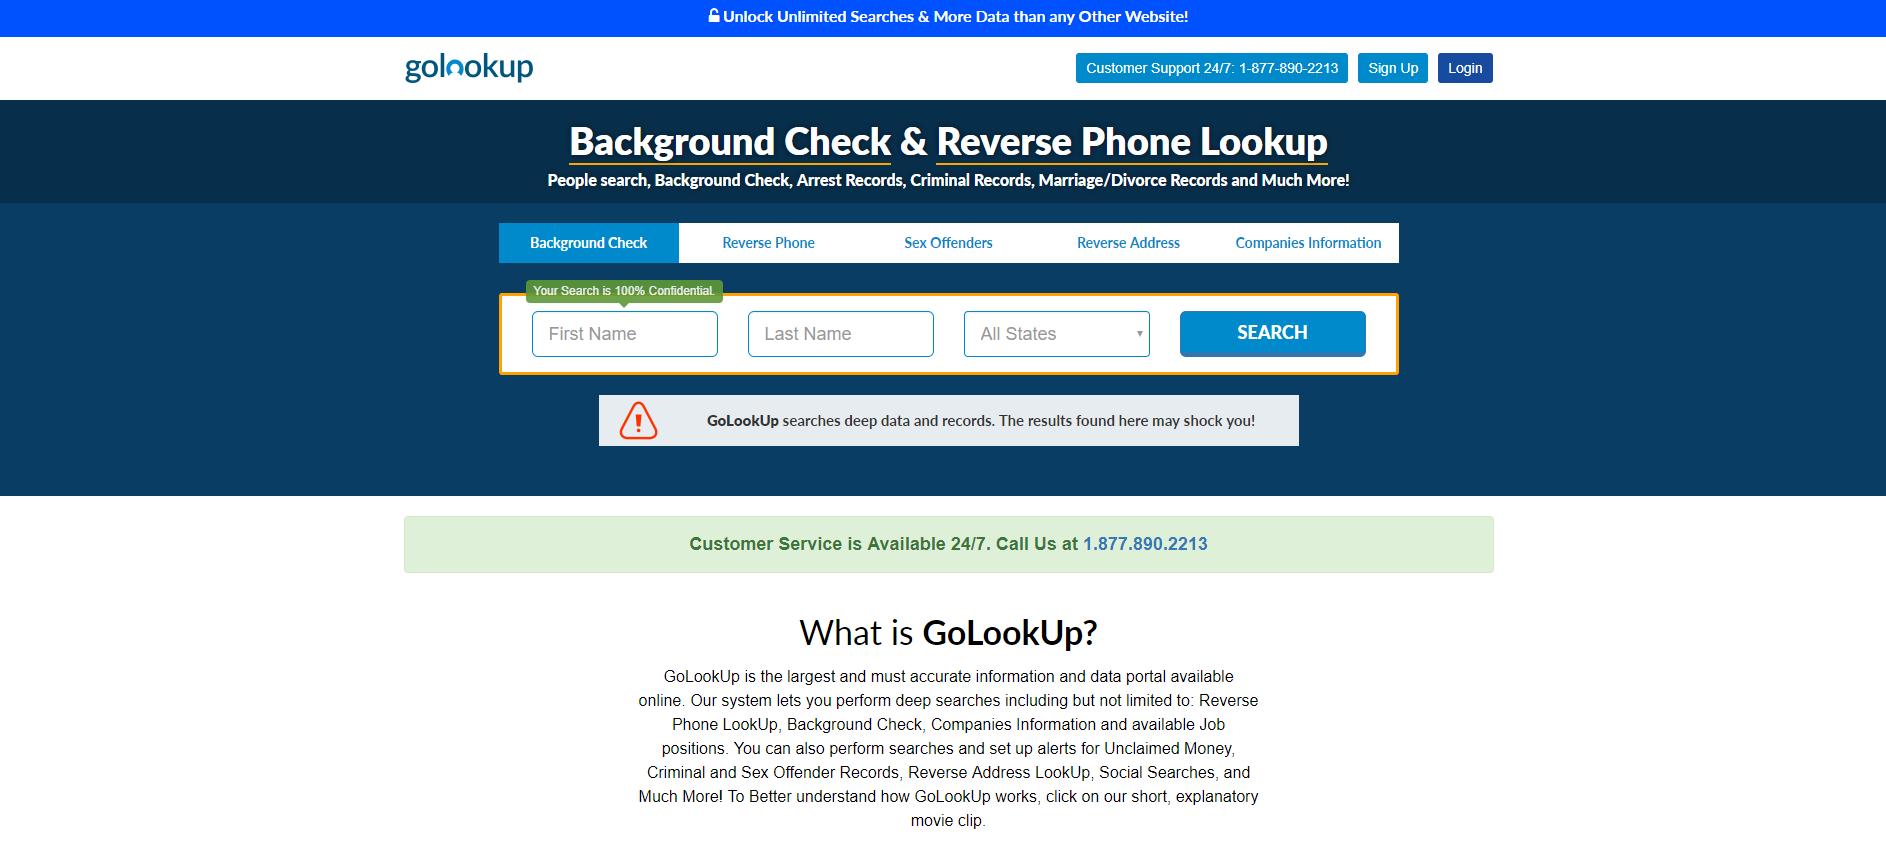 companies golookup